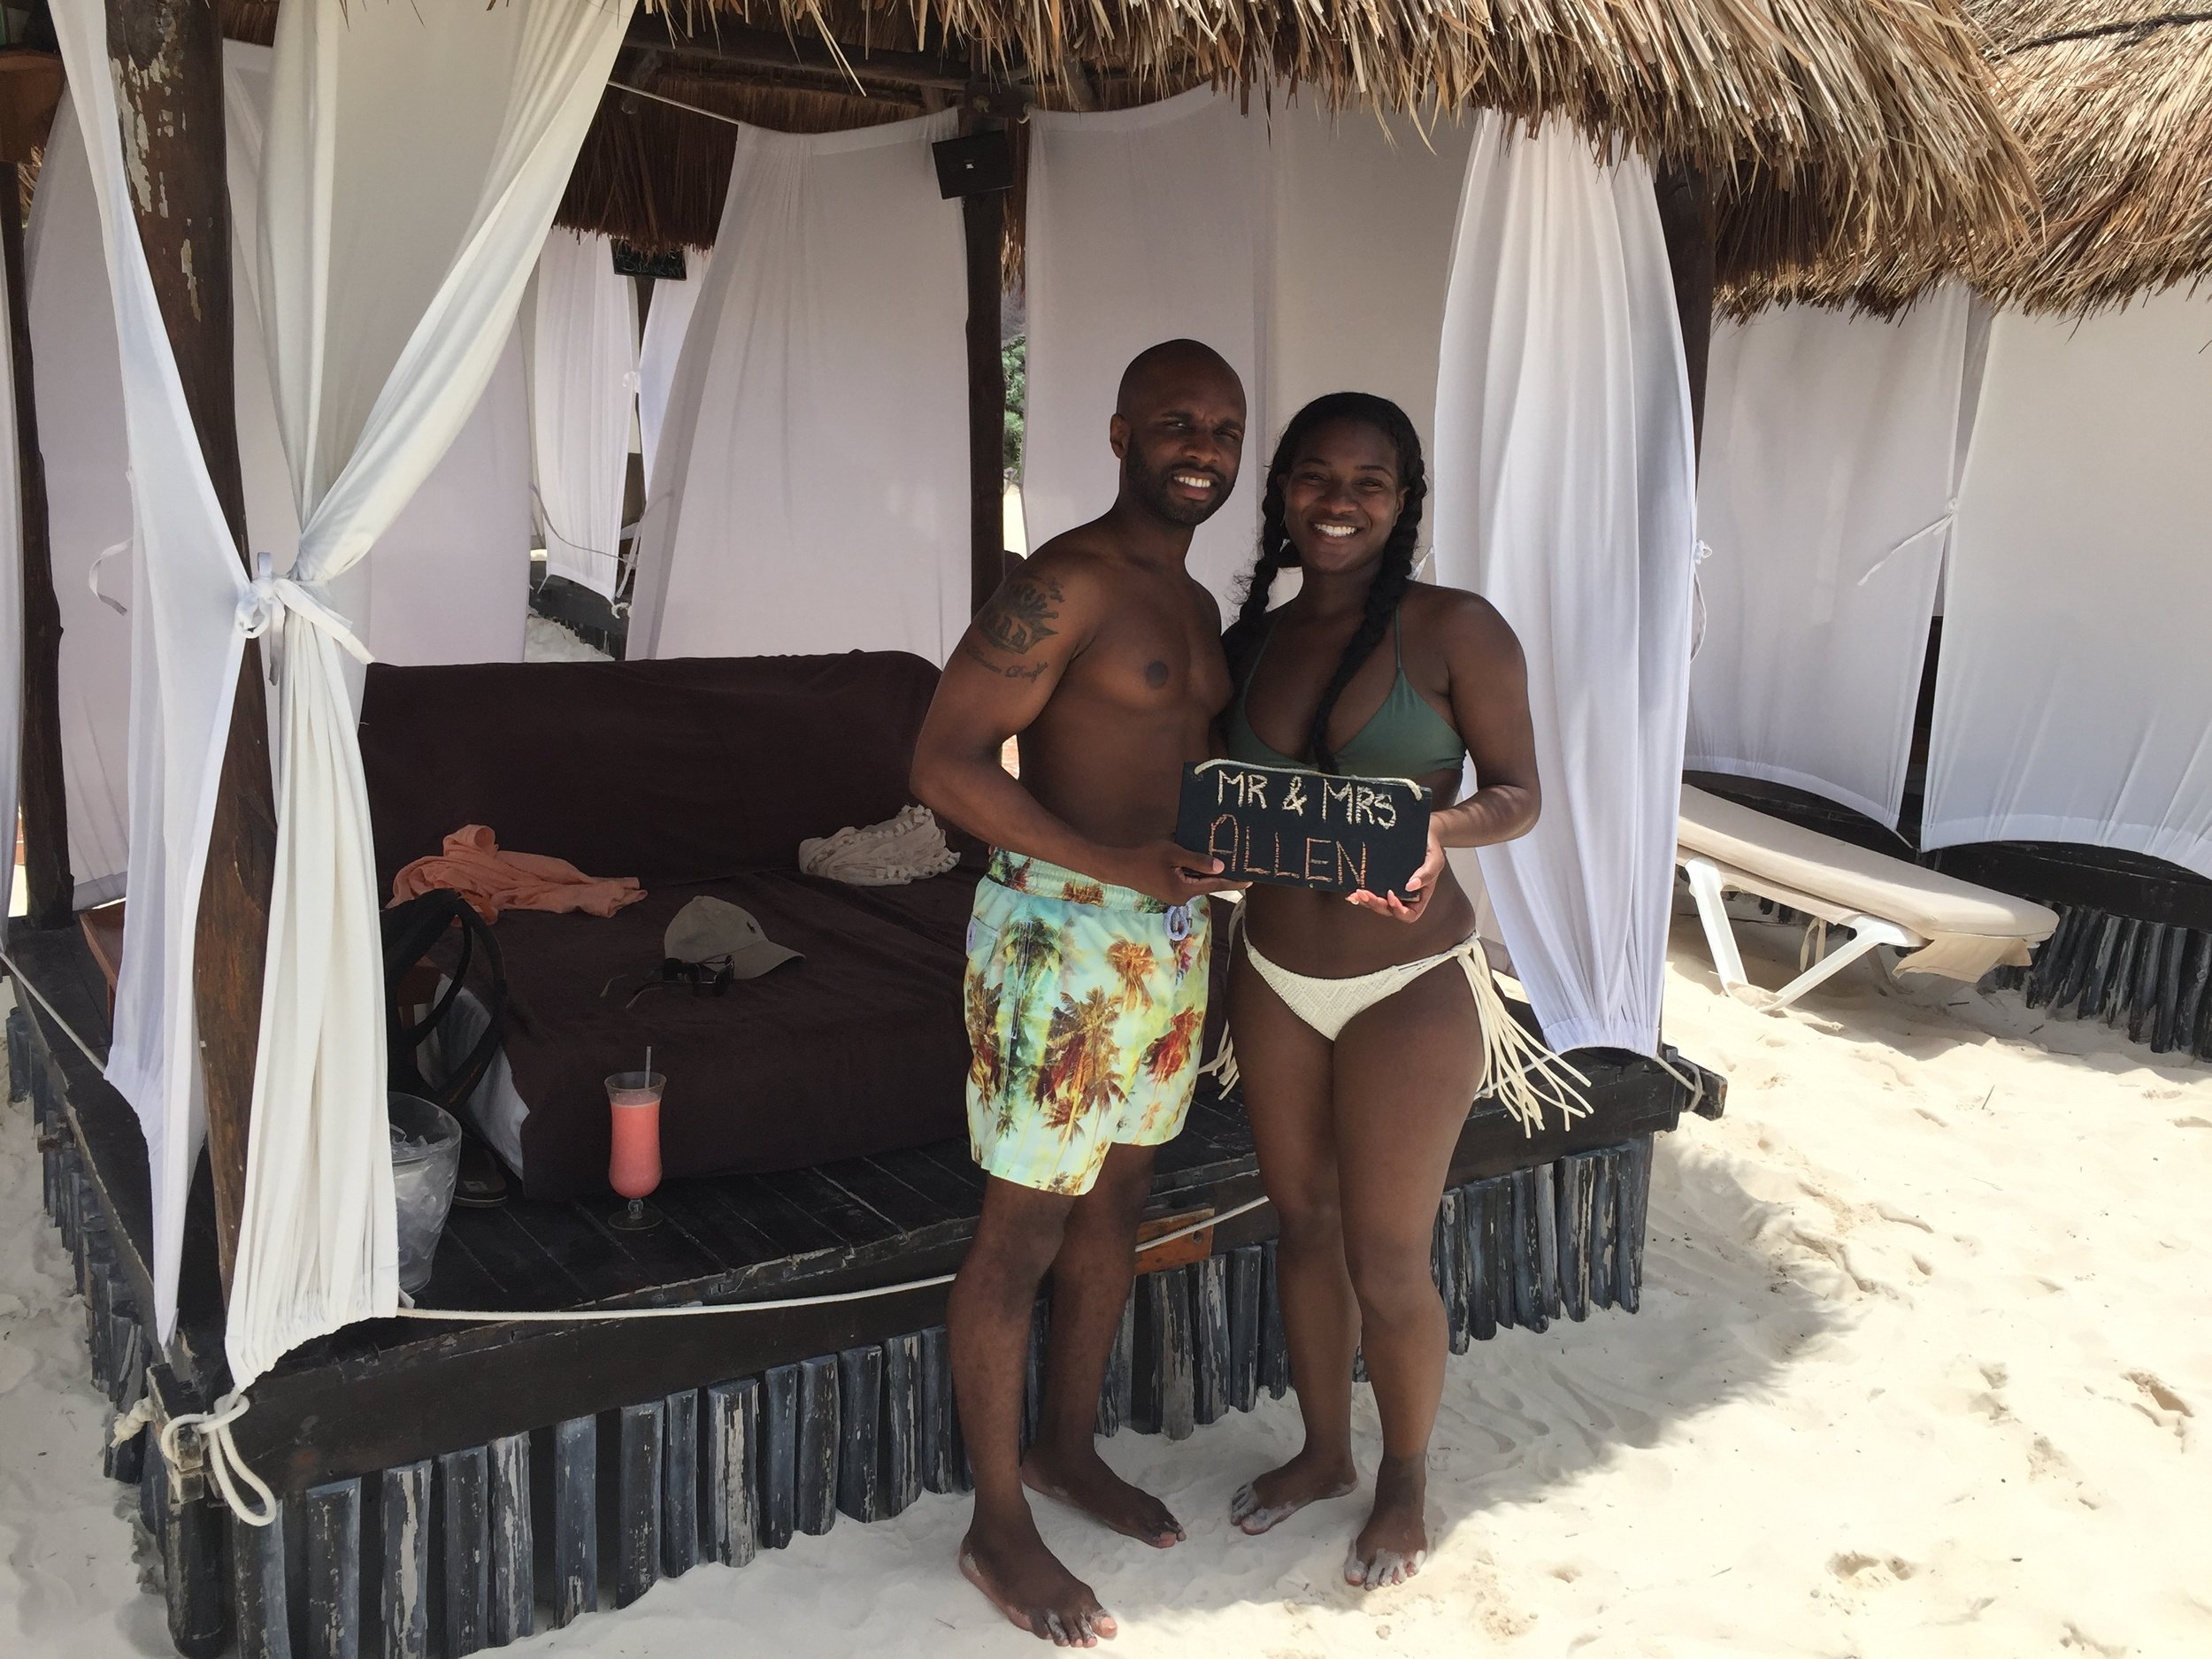 Black Destination Bride - BlackDesti Wedding Countdown Journal - Bridefriends Podcast - 1 Playa del Carmen Mexico - Secrets Maroma beach cabana Chomi2.JPG